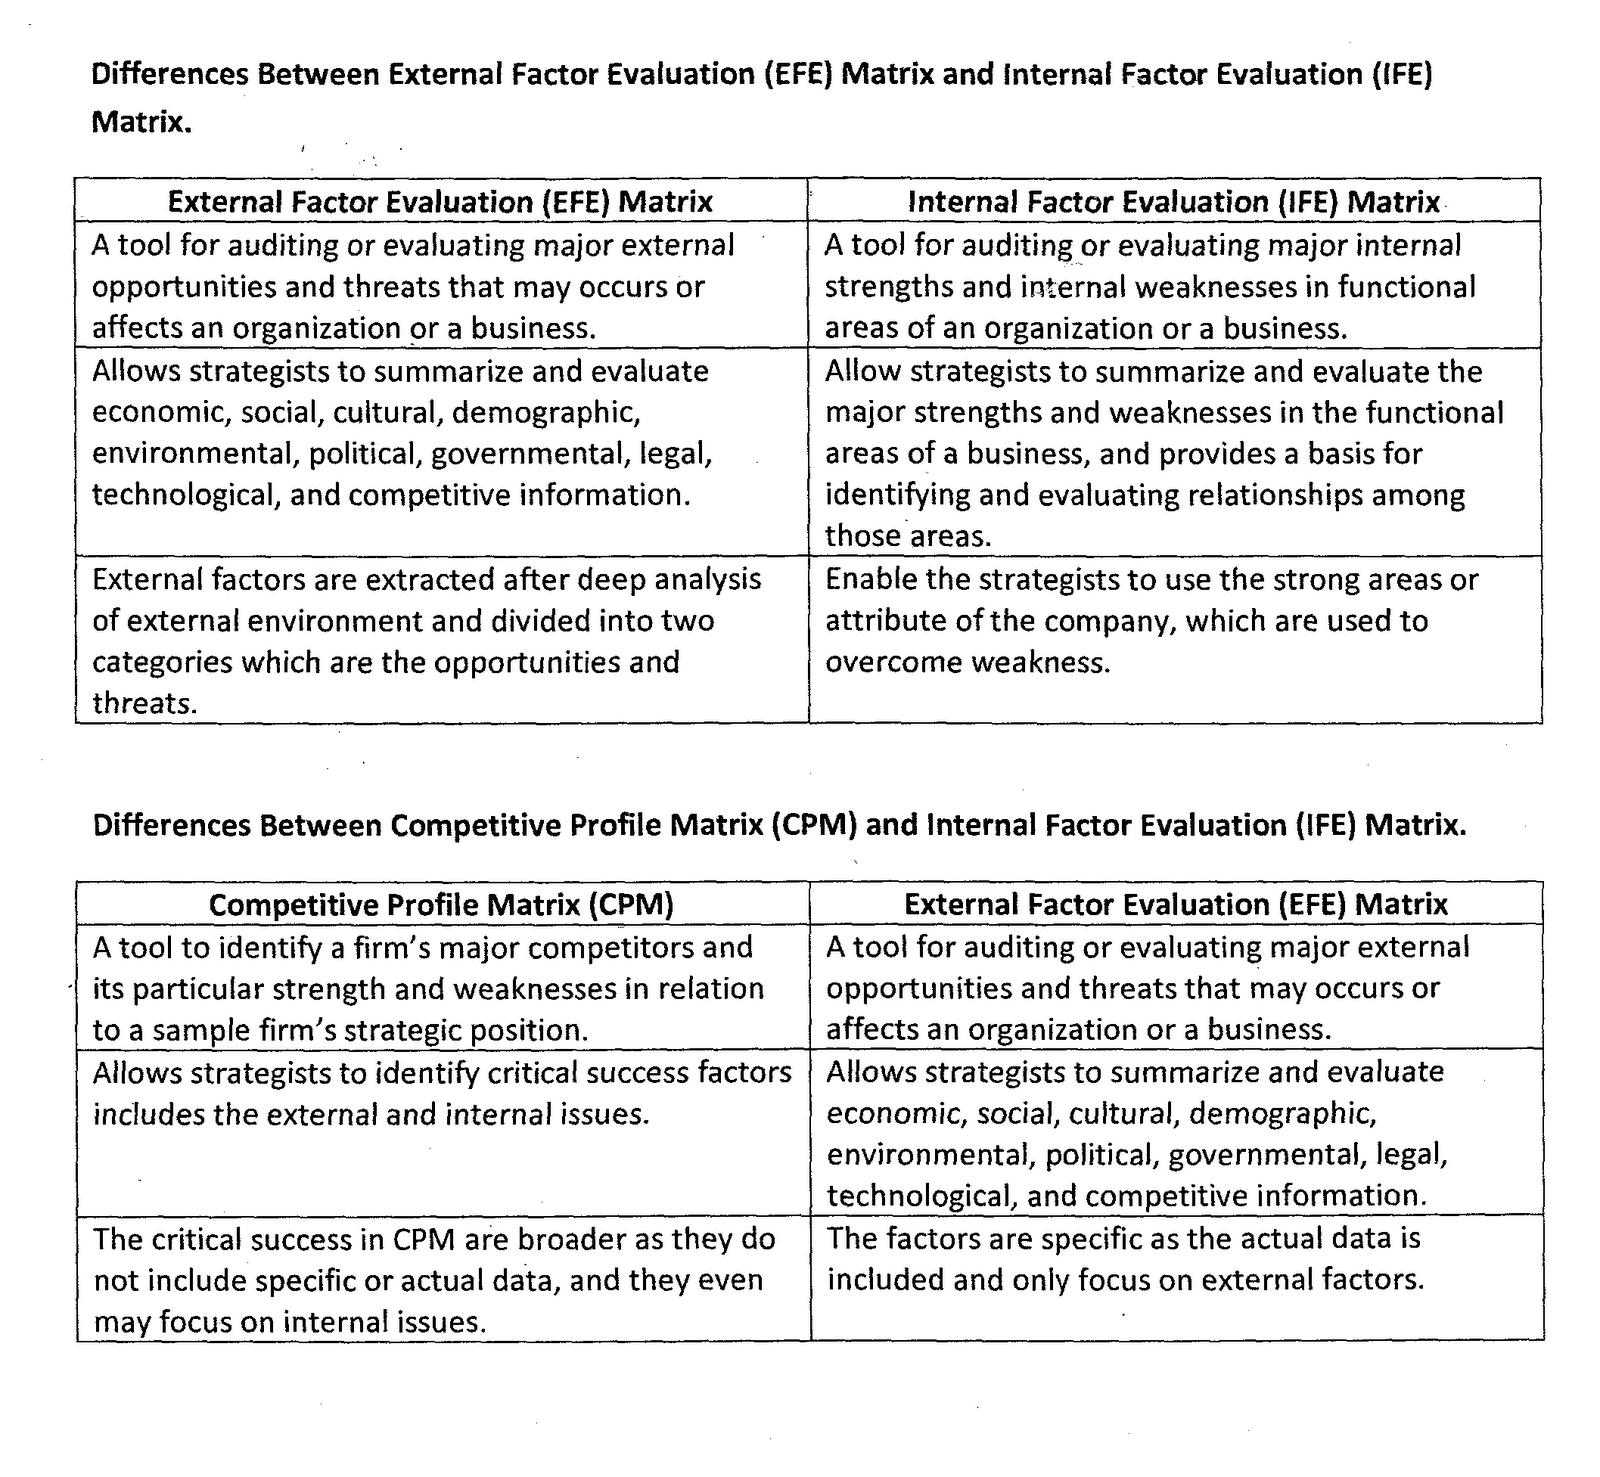 external factors evaluation matrix of coca cola Answer to develop both an external factor evaluation (efe) matrix coca cola company has been used for analyzing the internal factor and external factor evaluation.